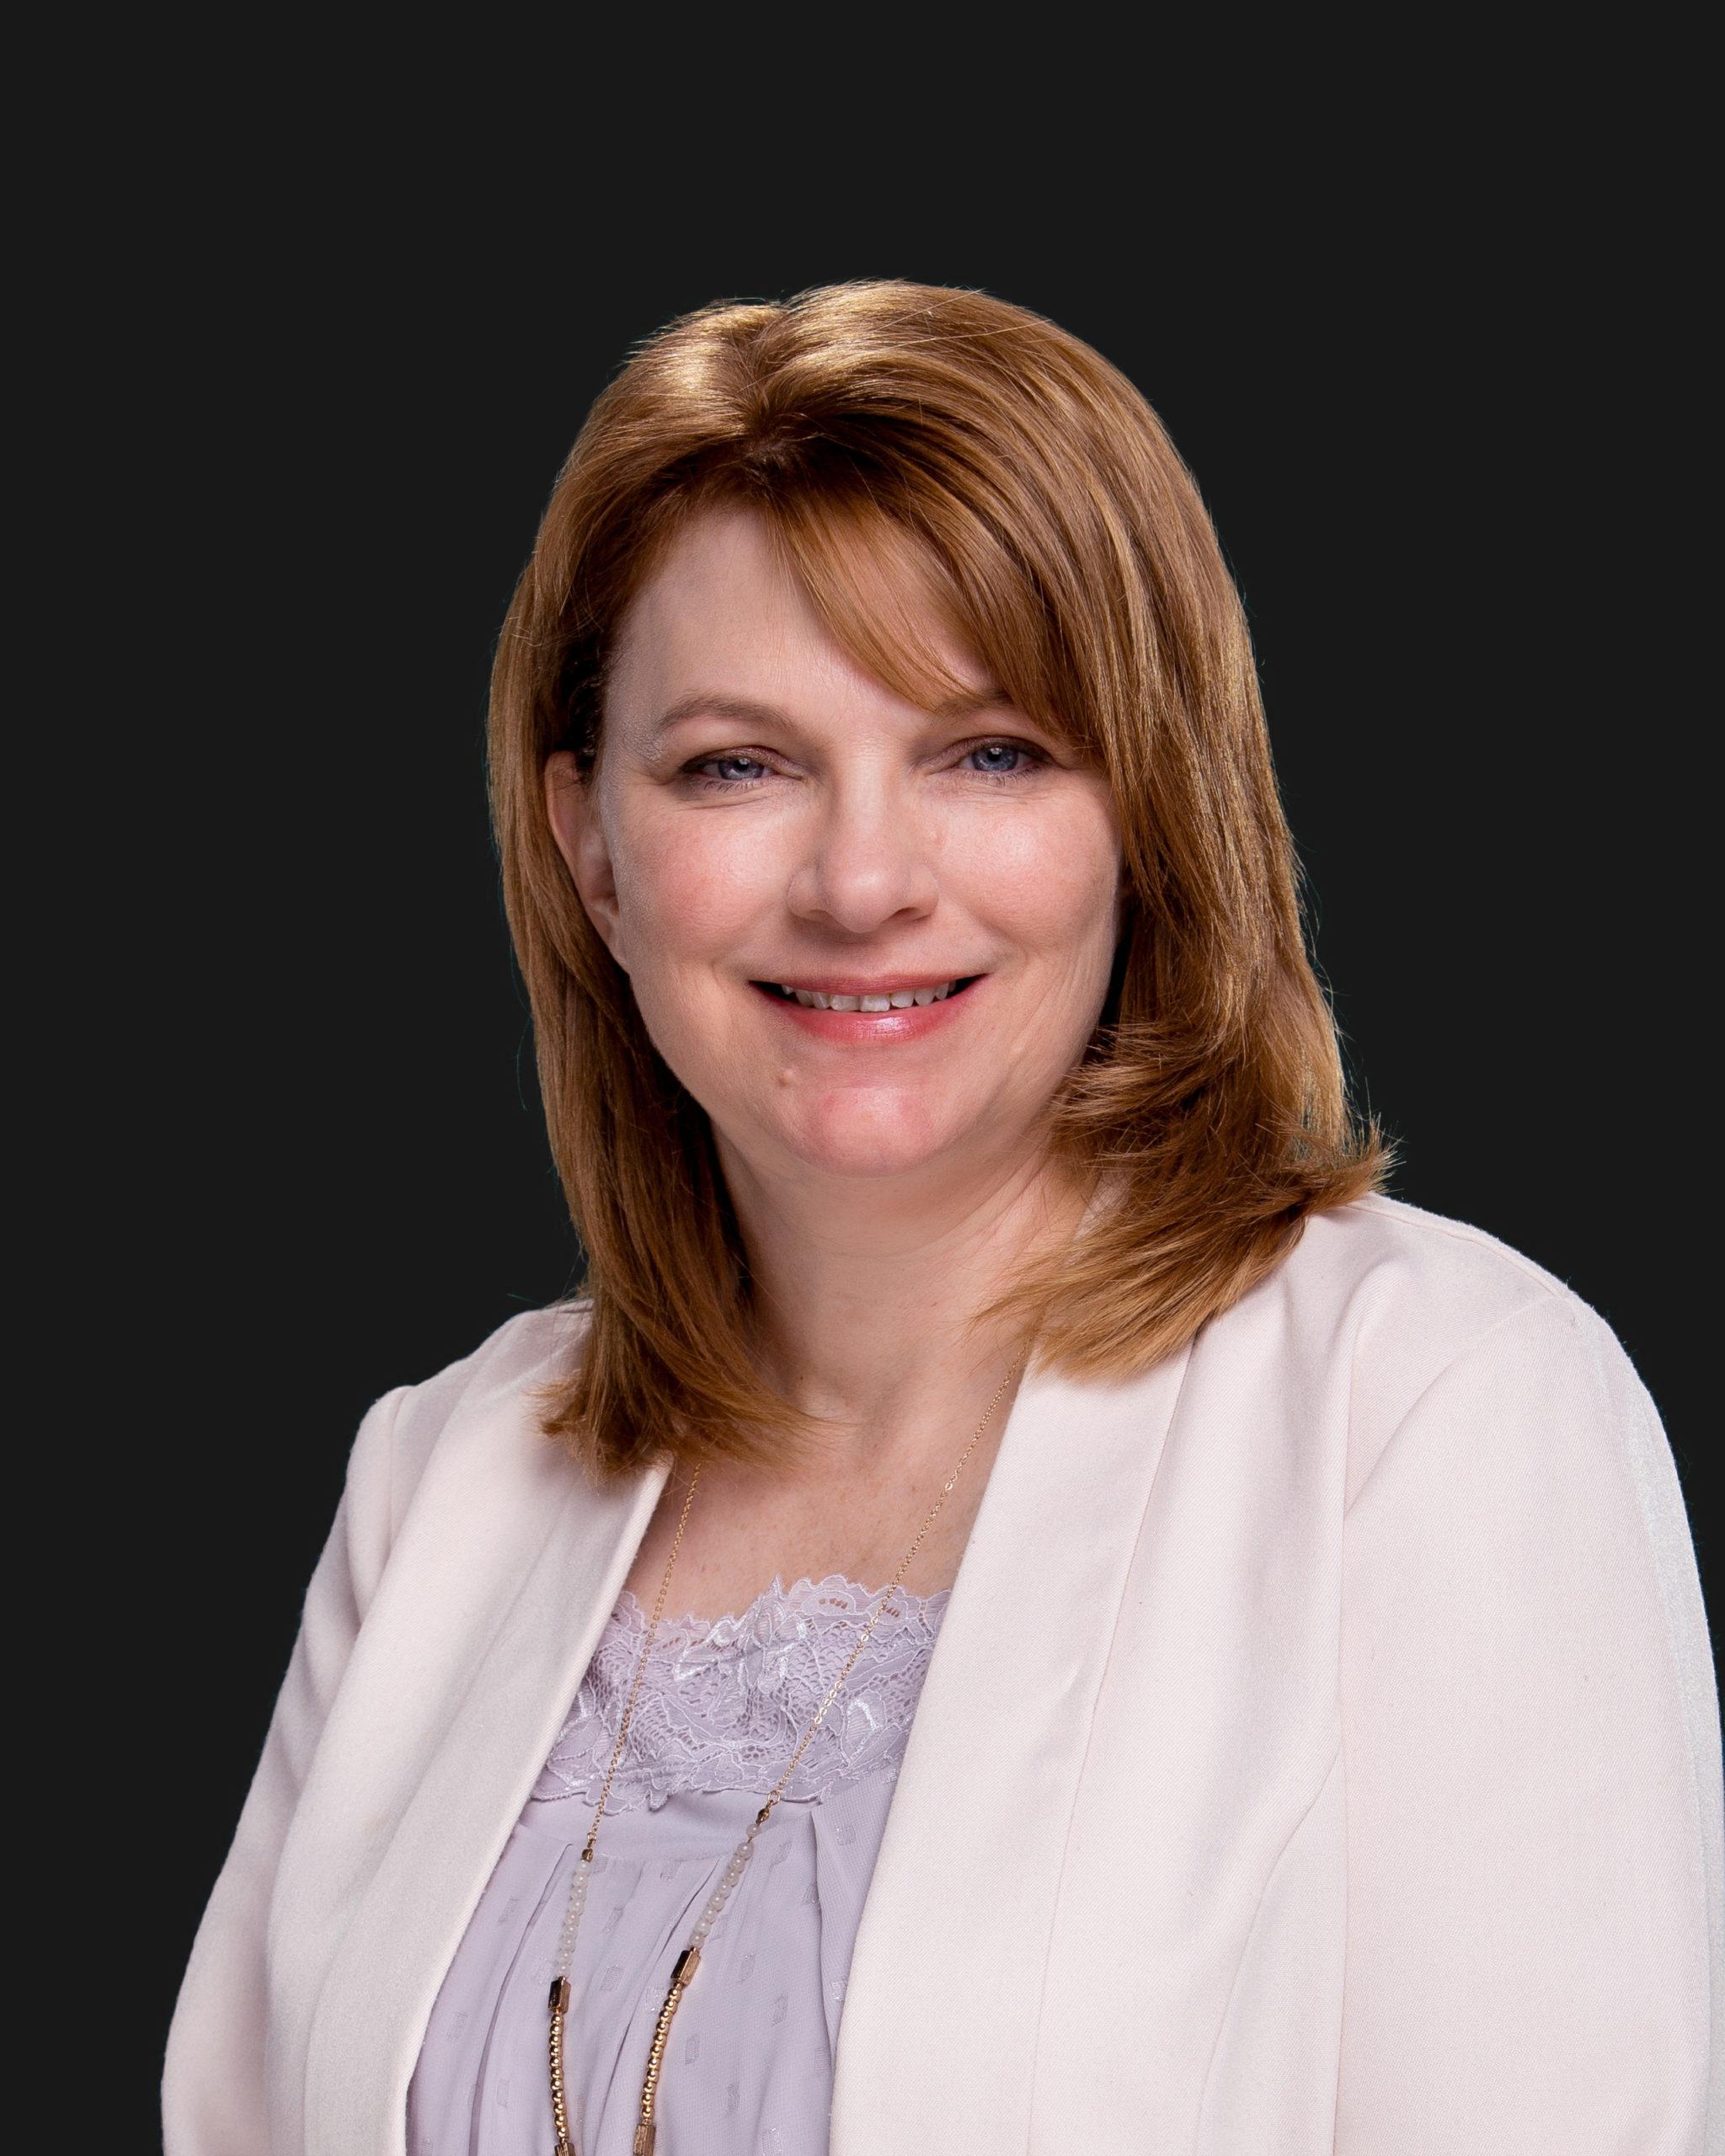 Amy Barton HS